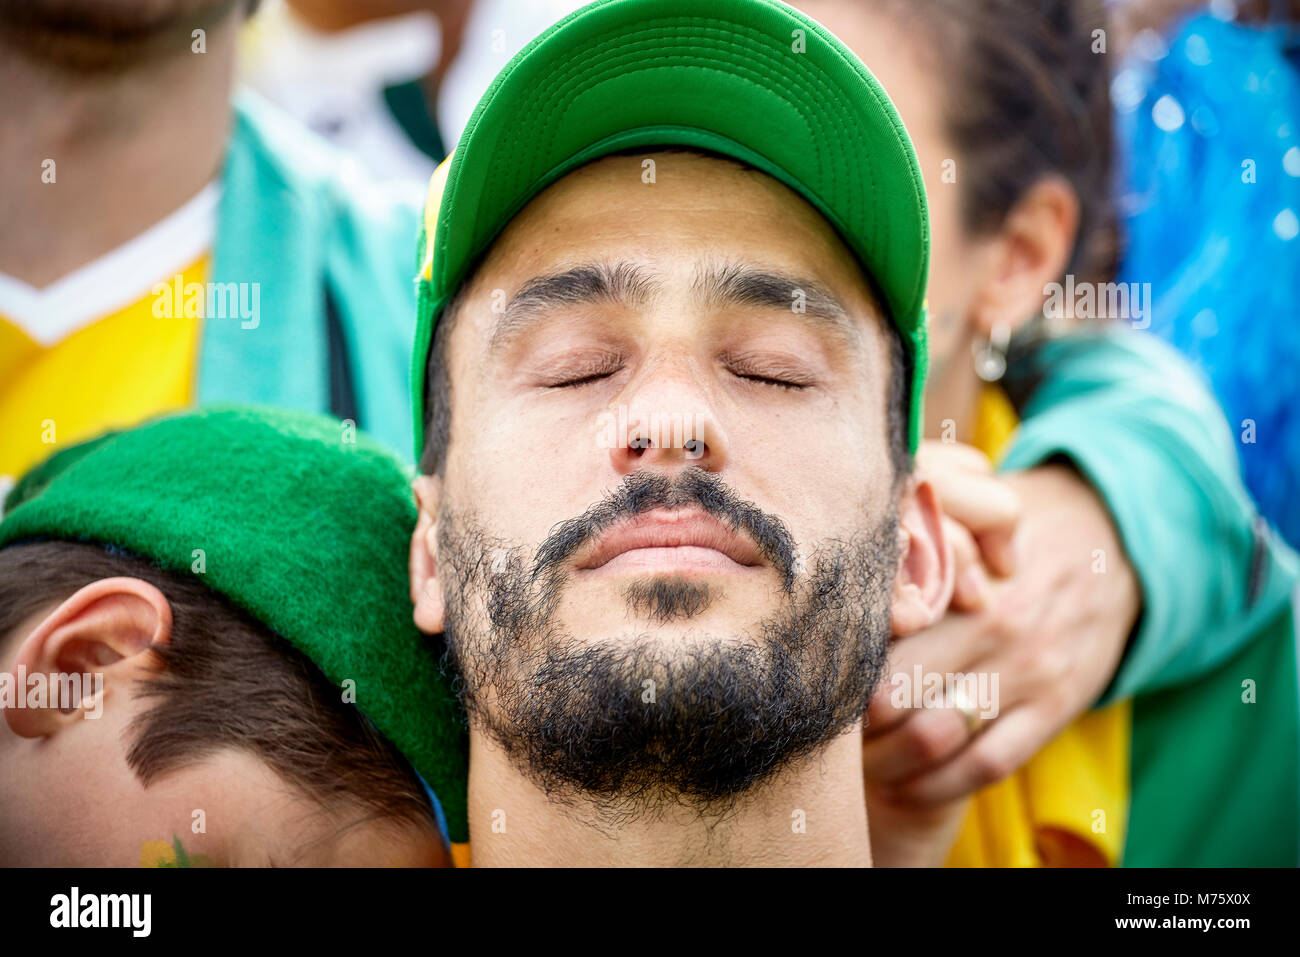 Fußball-Fan mit Kopf und Augen in Enttäuschung geschlossen Stockbild